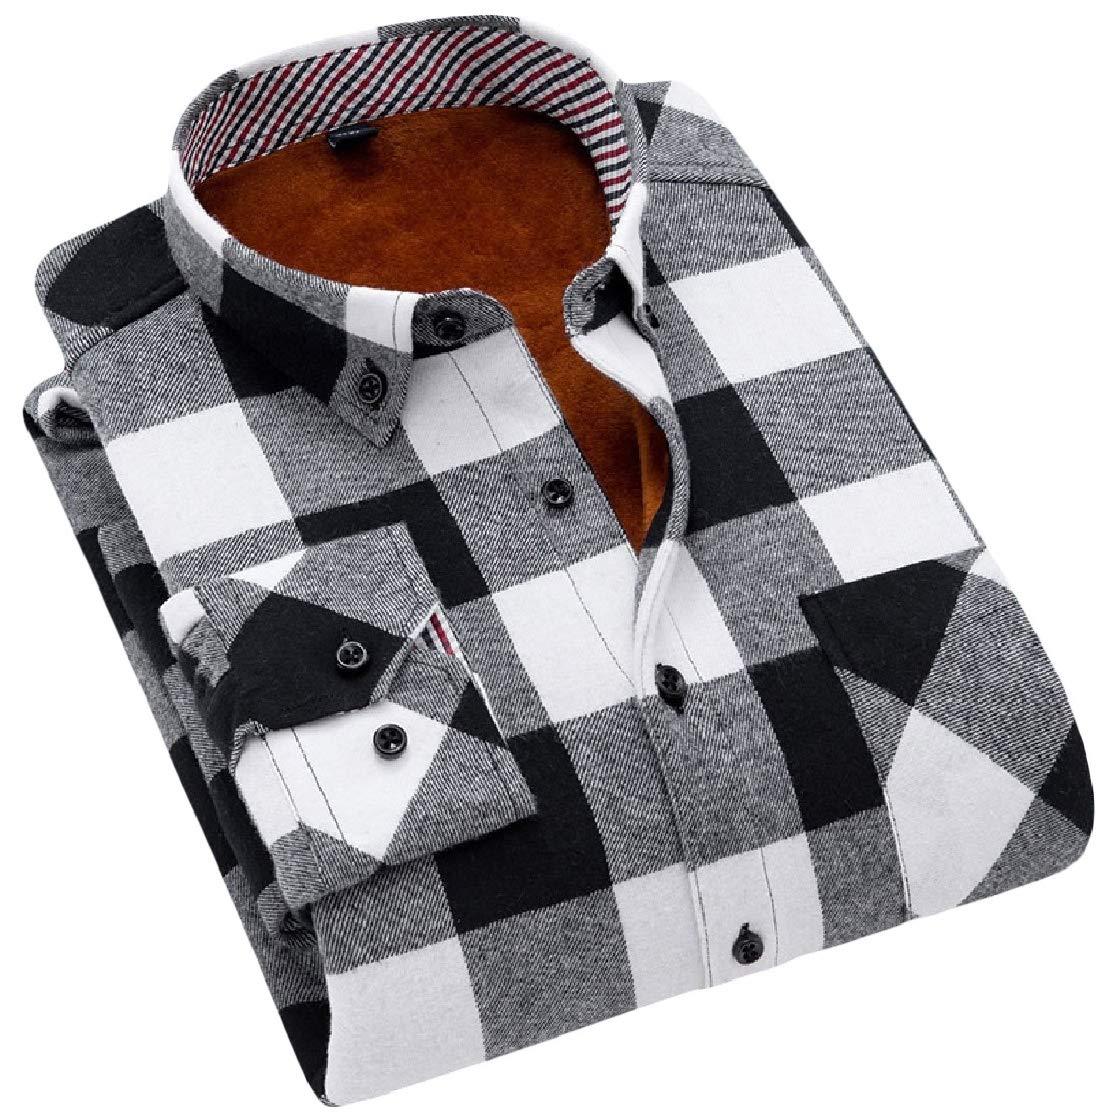 YUNY Men Fall Weinter Fit Thick Velvet Lapel Warm Plaid Work Flannel Shirt AS3 M